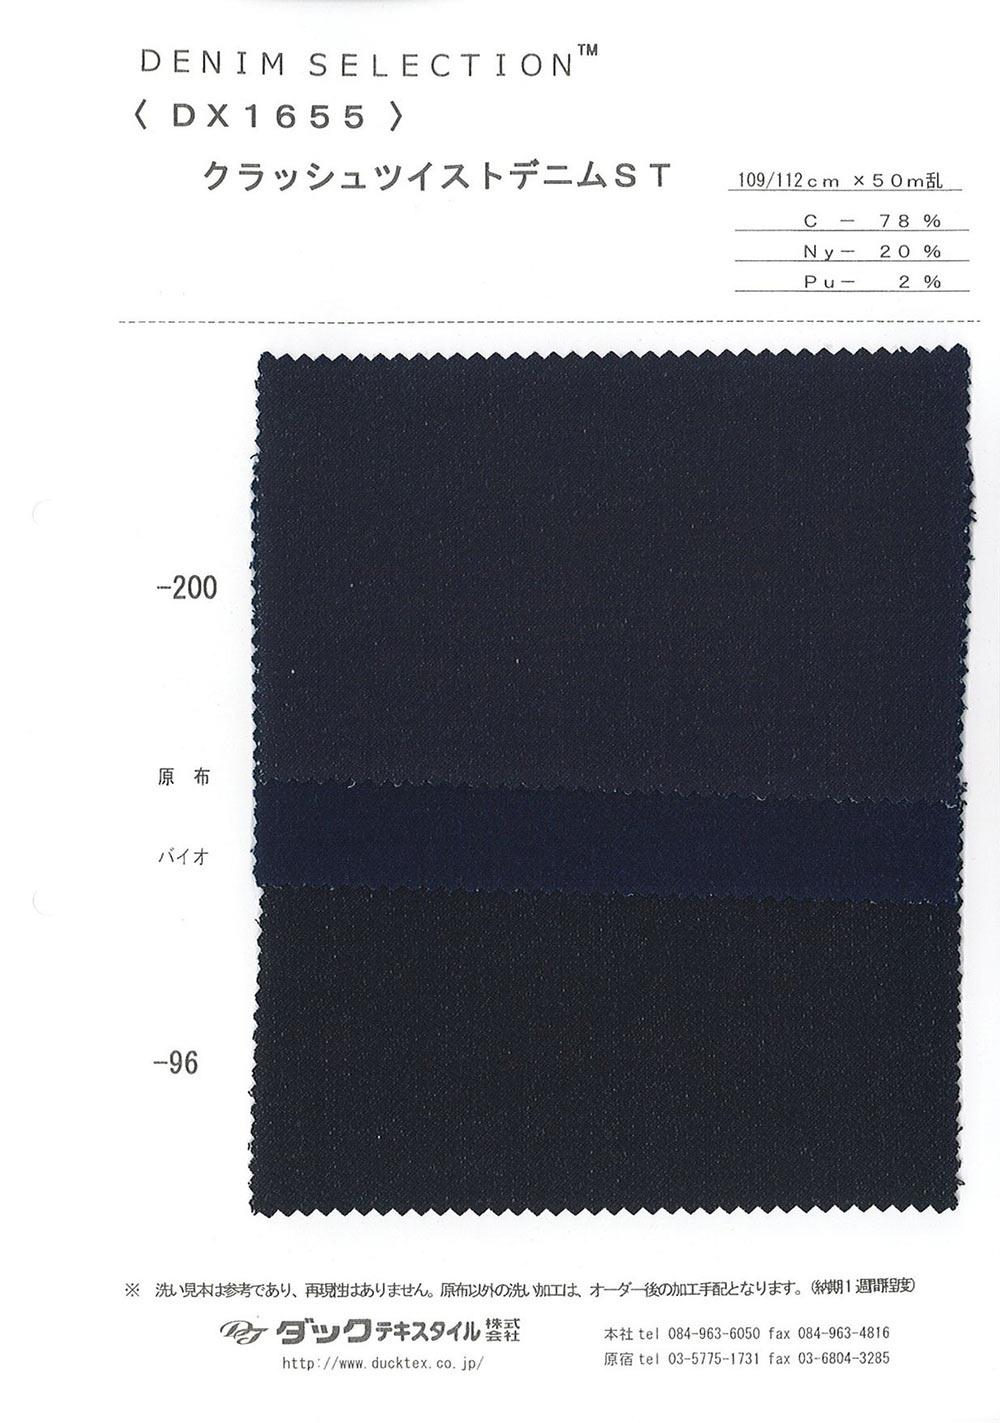 DX1655 10オンスクラッシュツイストデニム[生地] ダックテキスタイル/オークラ商事 - ApparelX アパレル資材卸通販